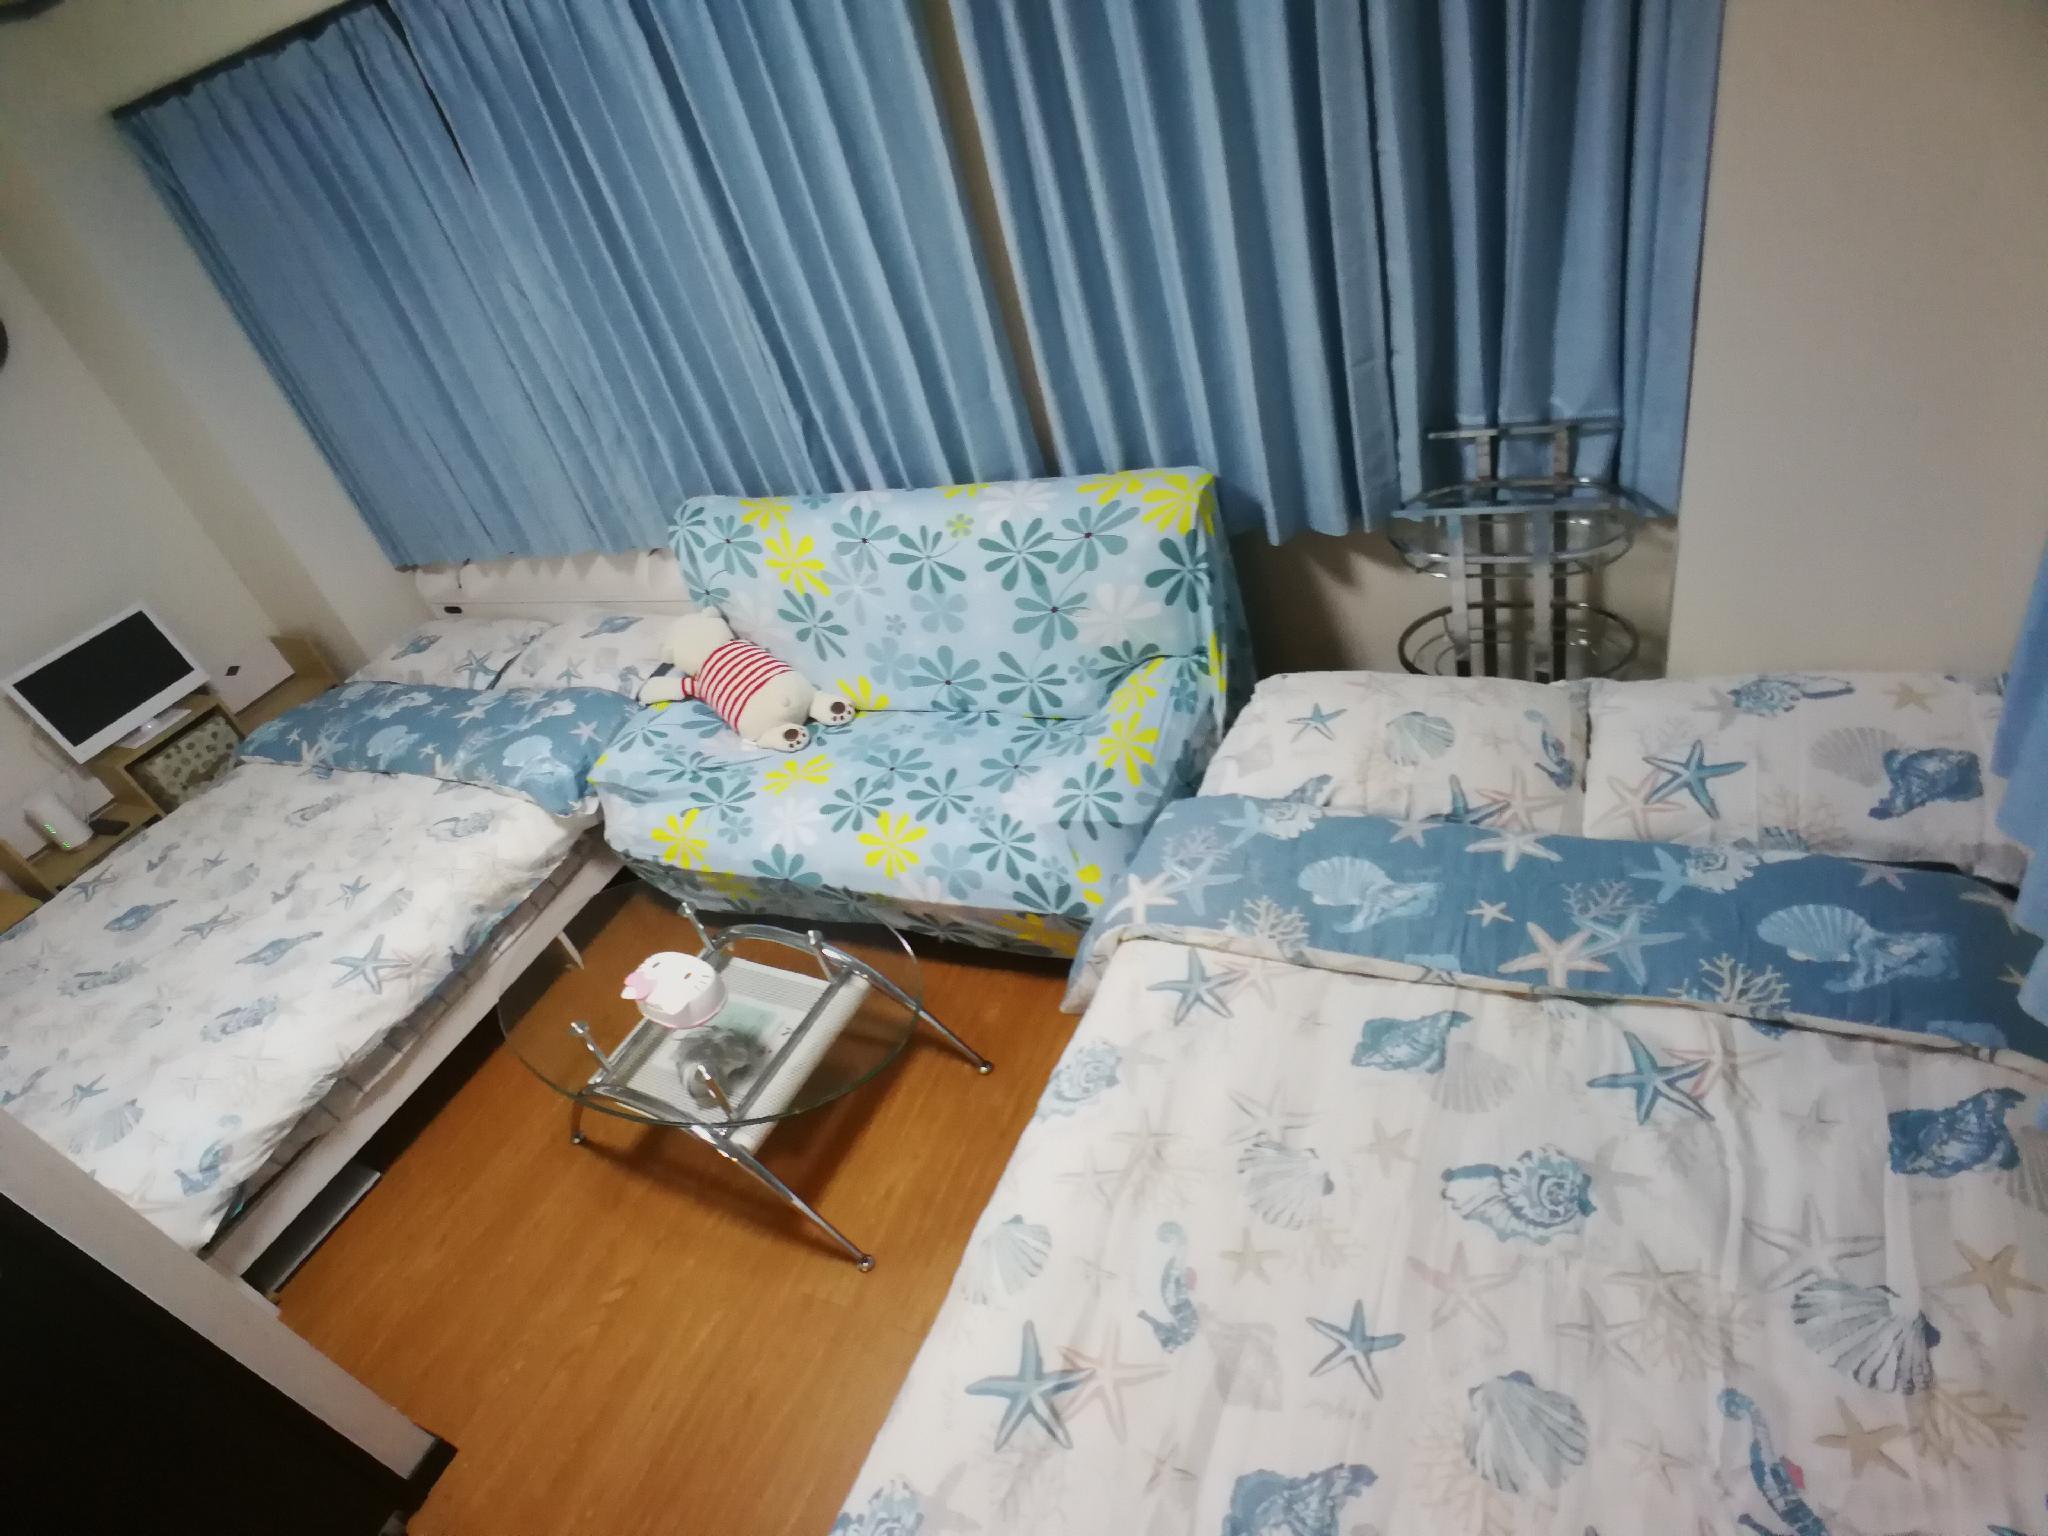 Room C Uguisudani Spacious And Cozy Apt